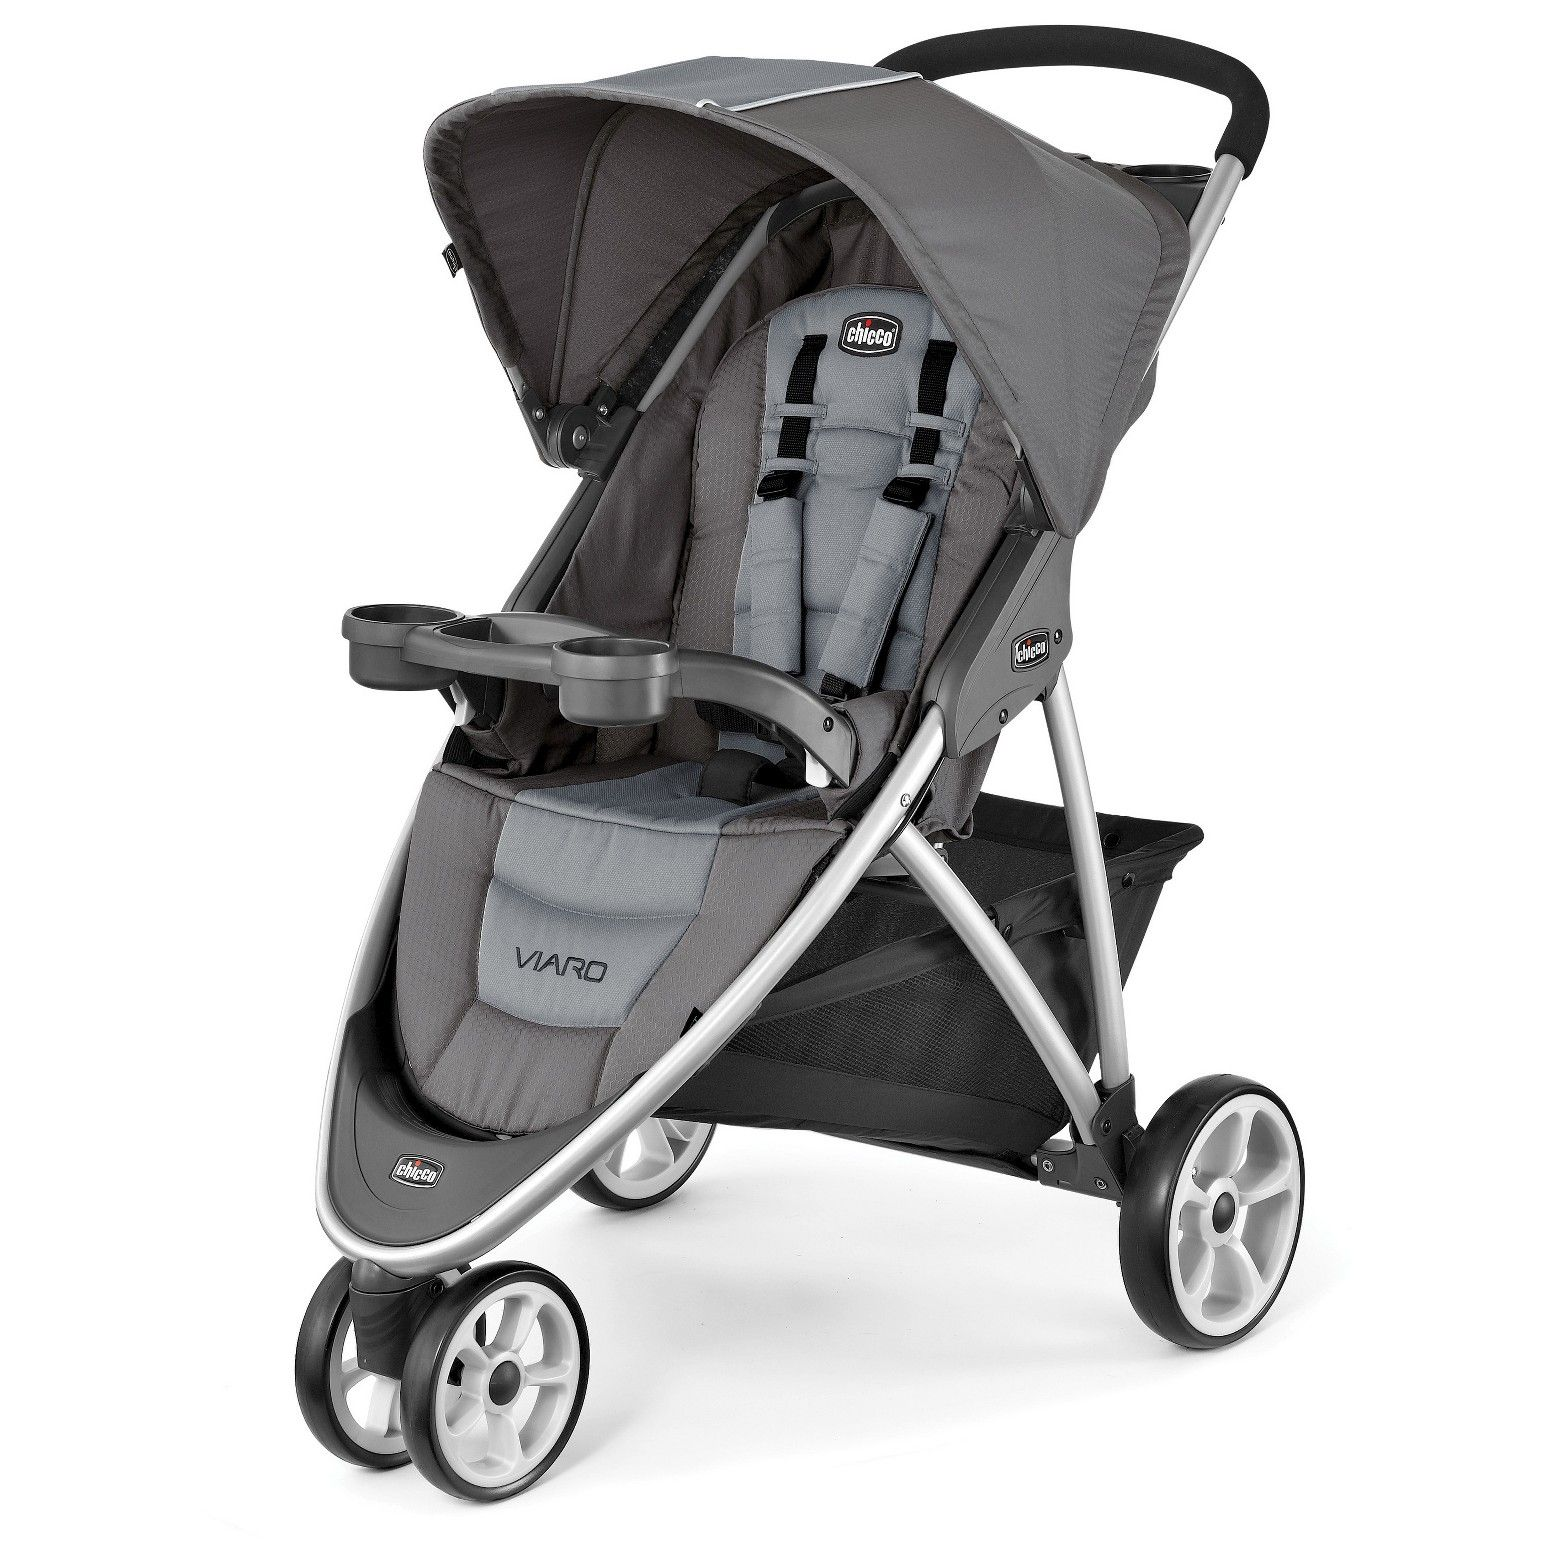 Chicco Viaro Stroller Graphite Stroller, Chicco stroller